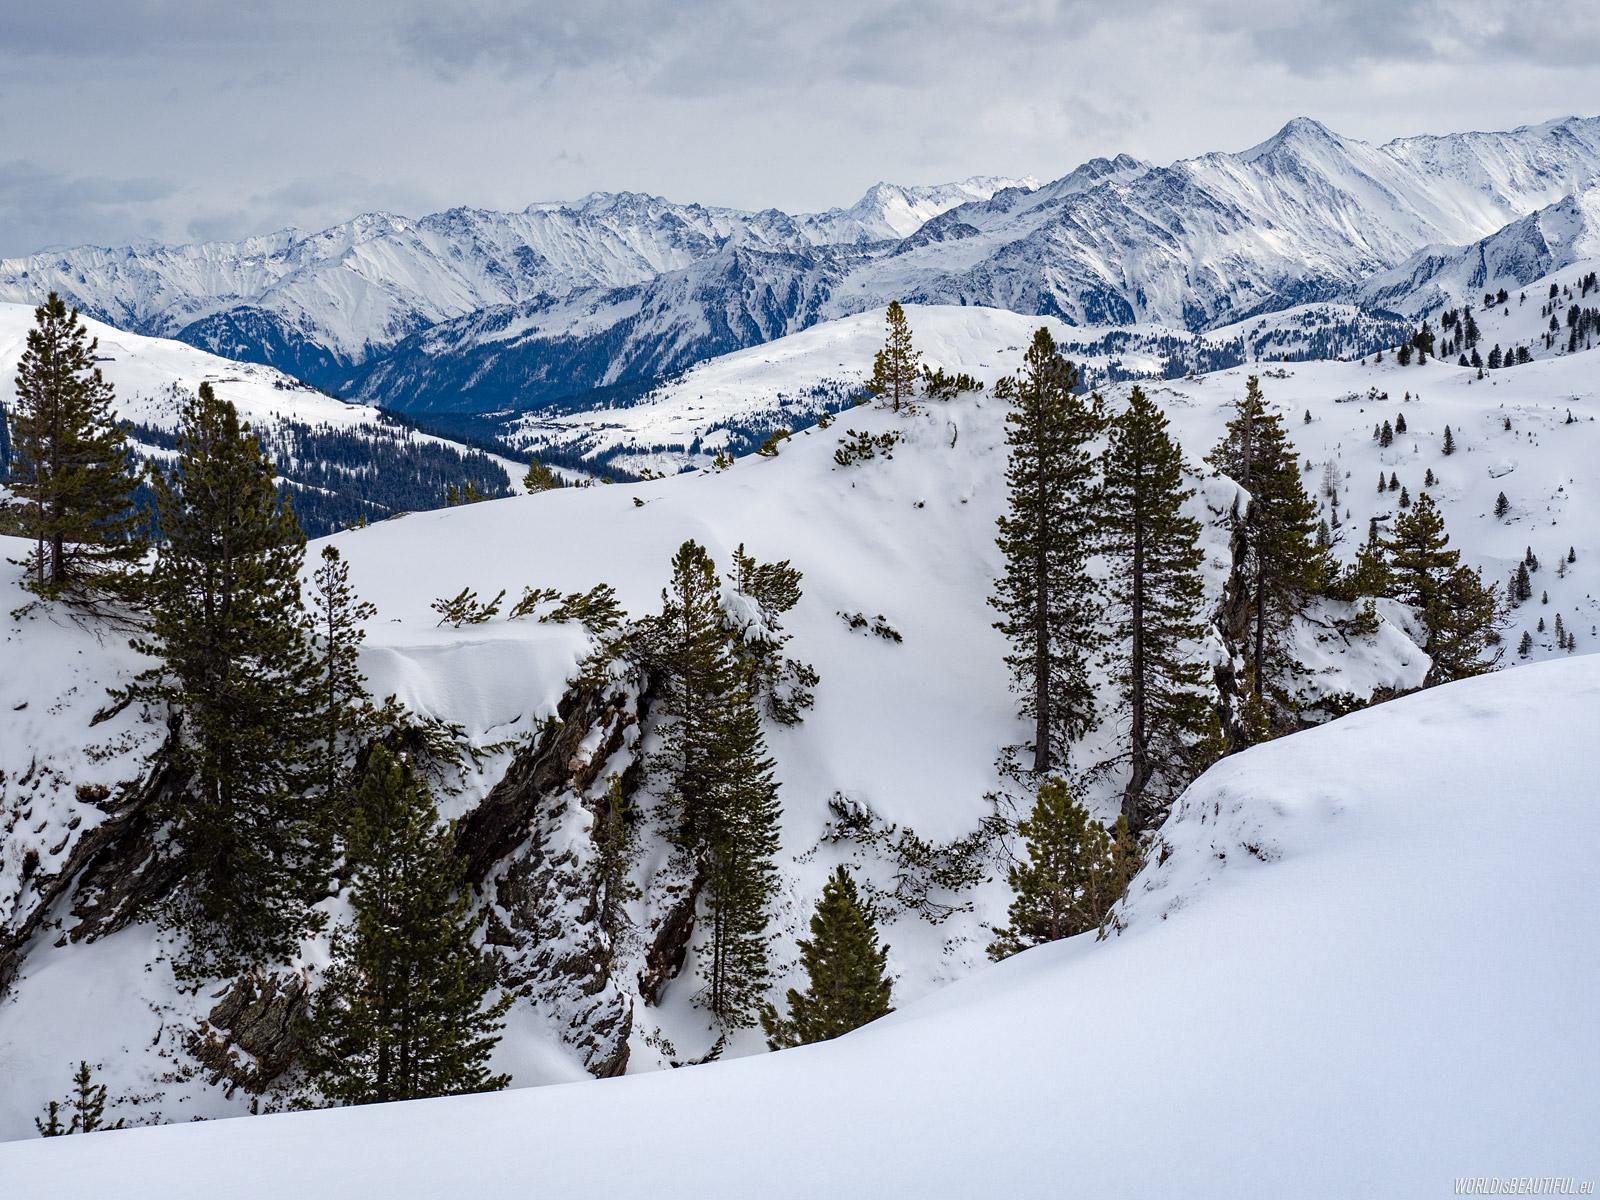 Winter Alpine views